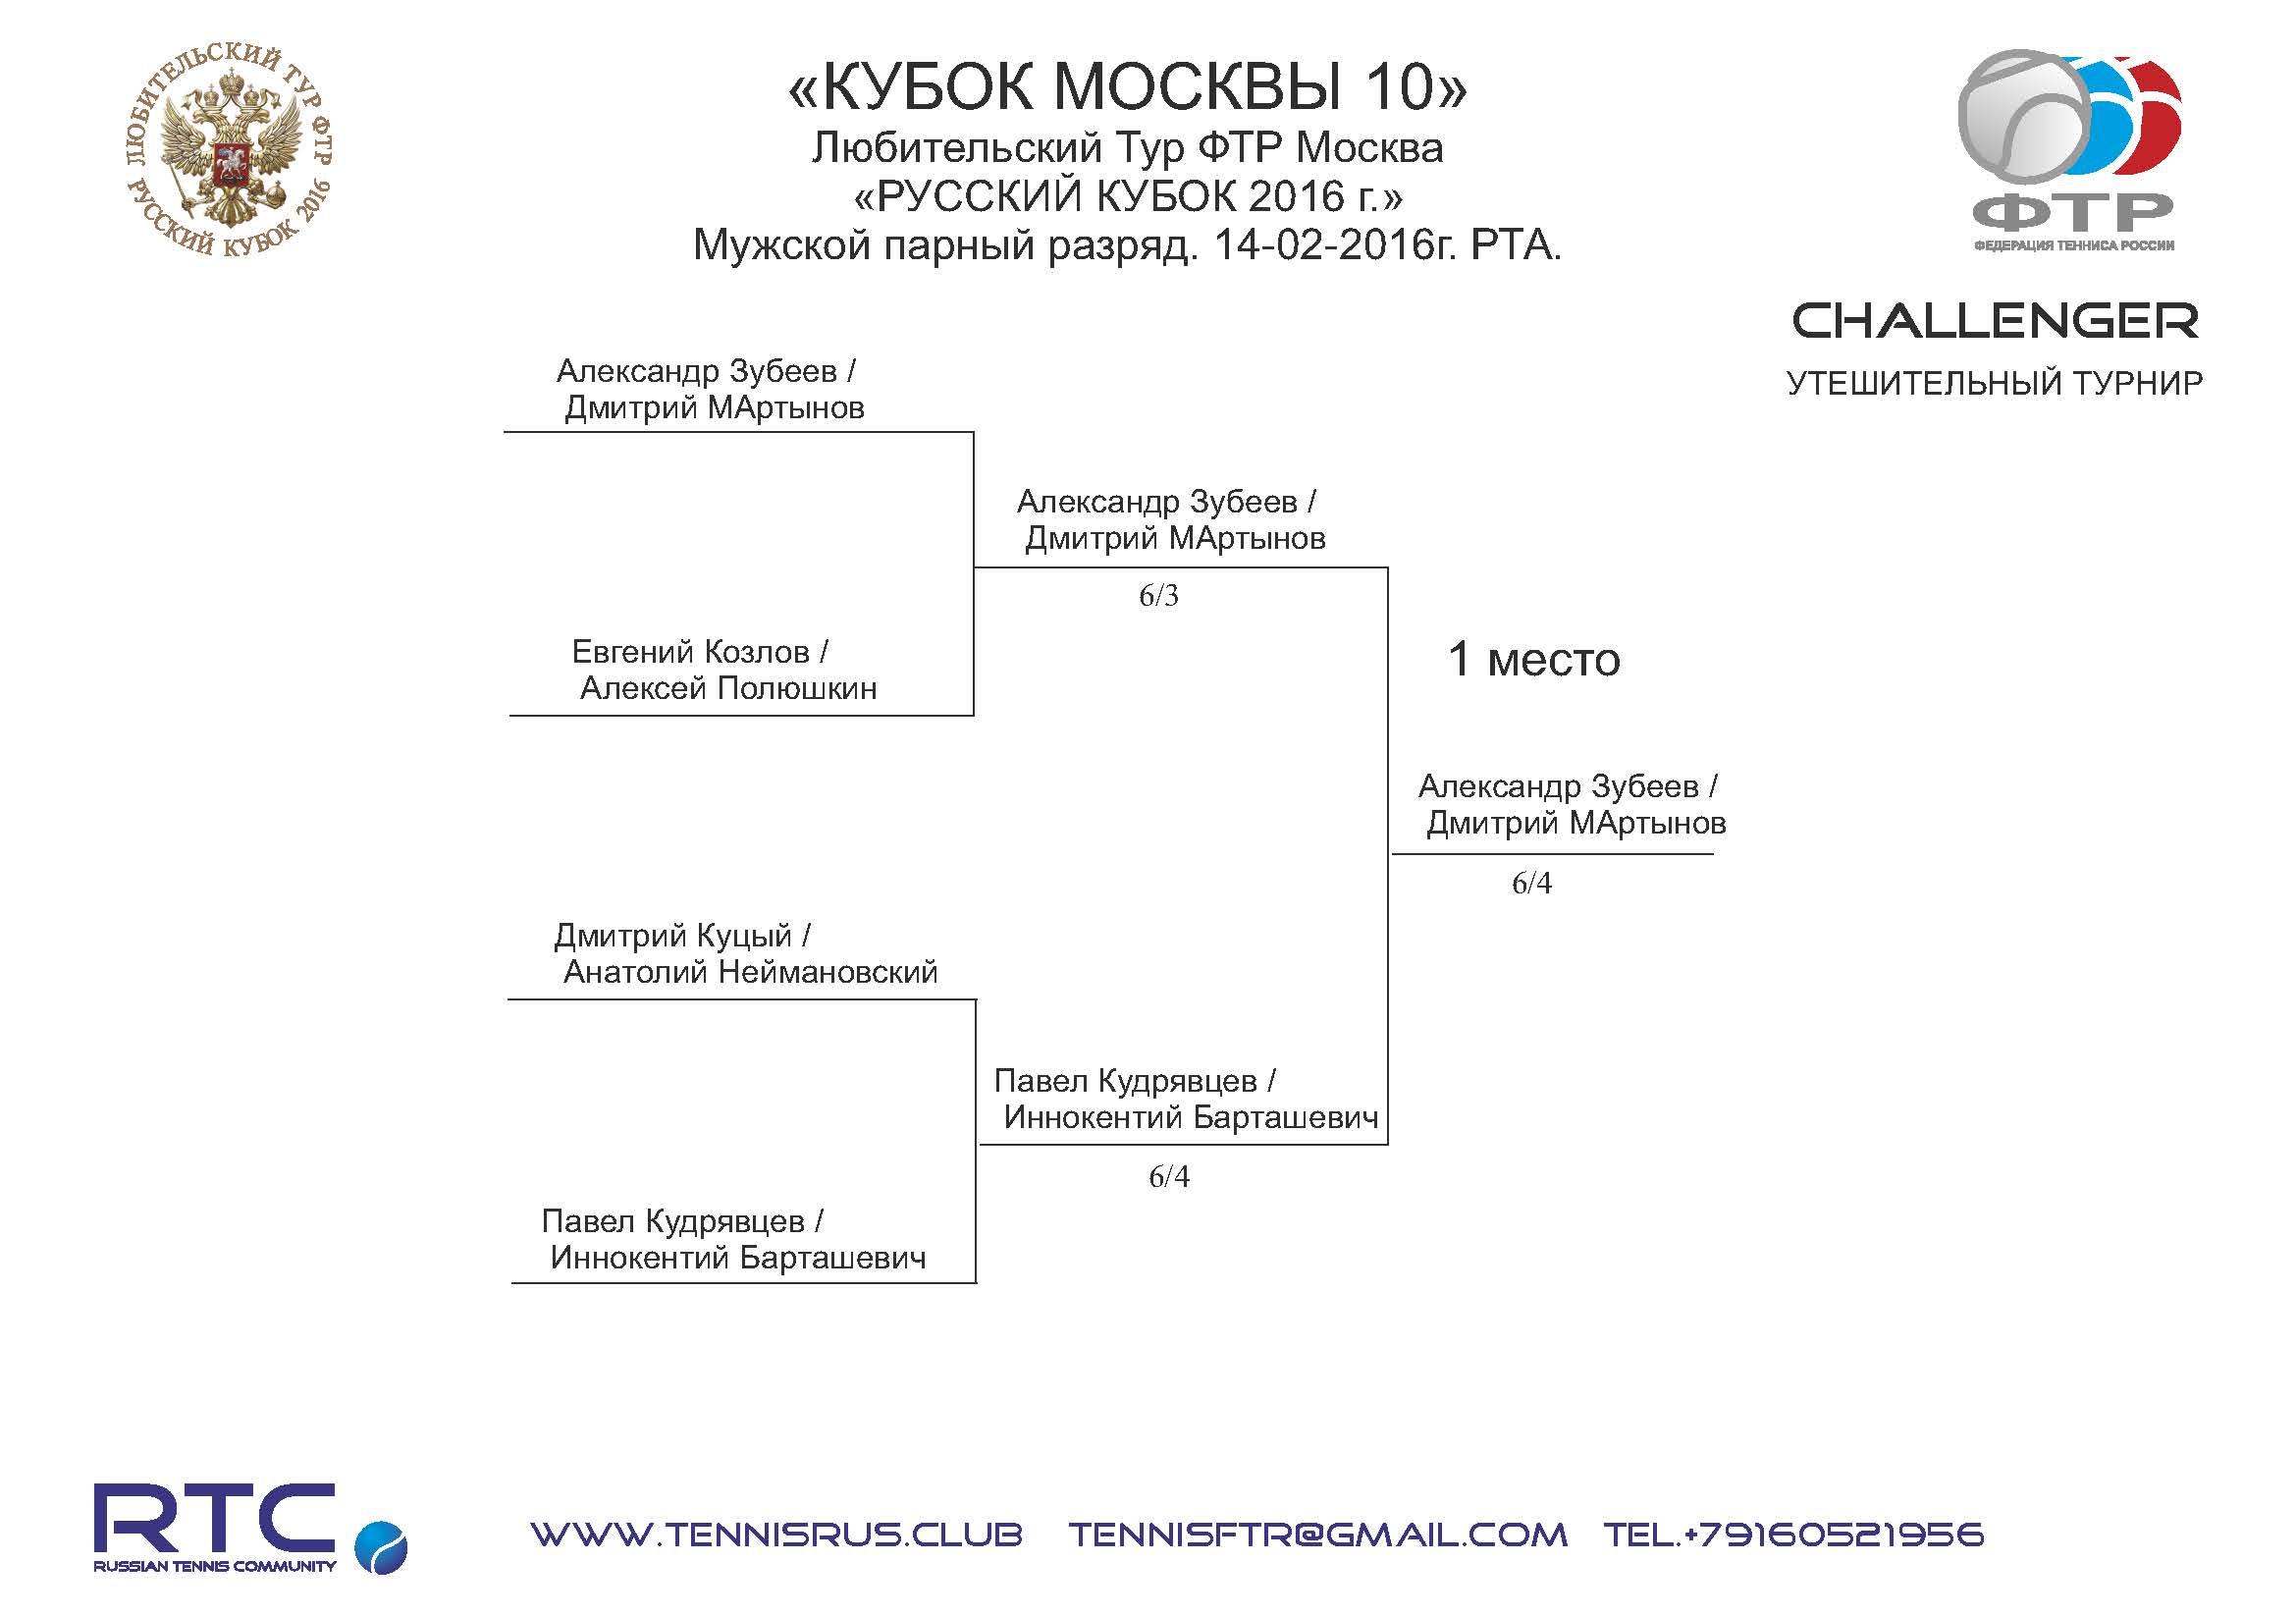 MC 10 2016 mens pairs Challenger NETs dop